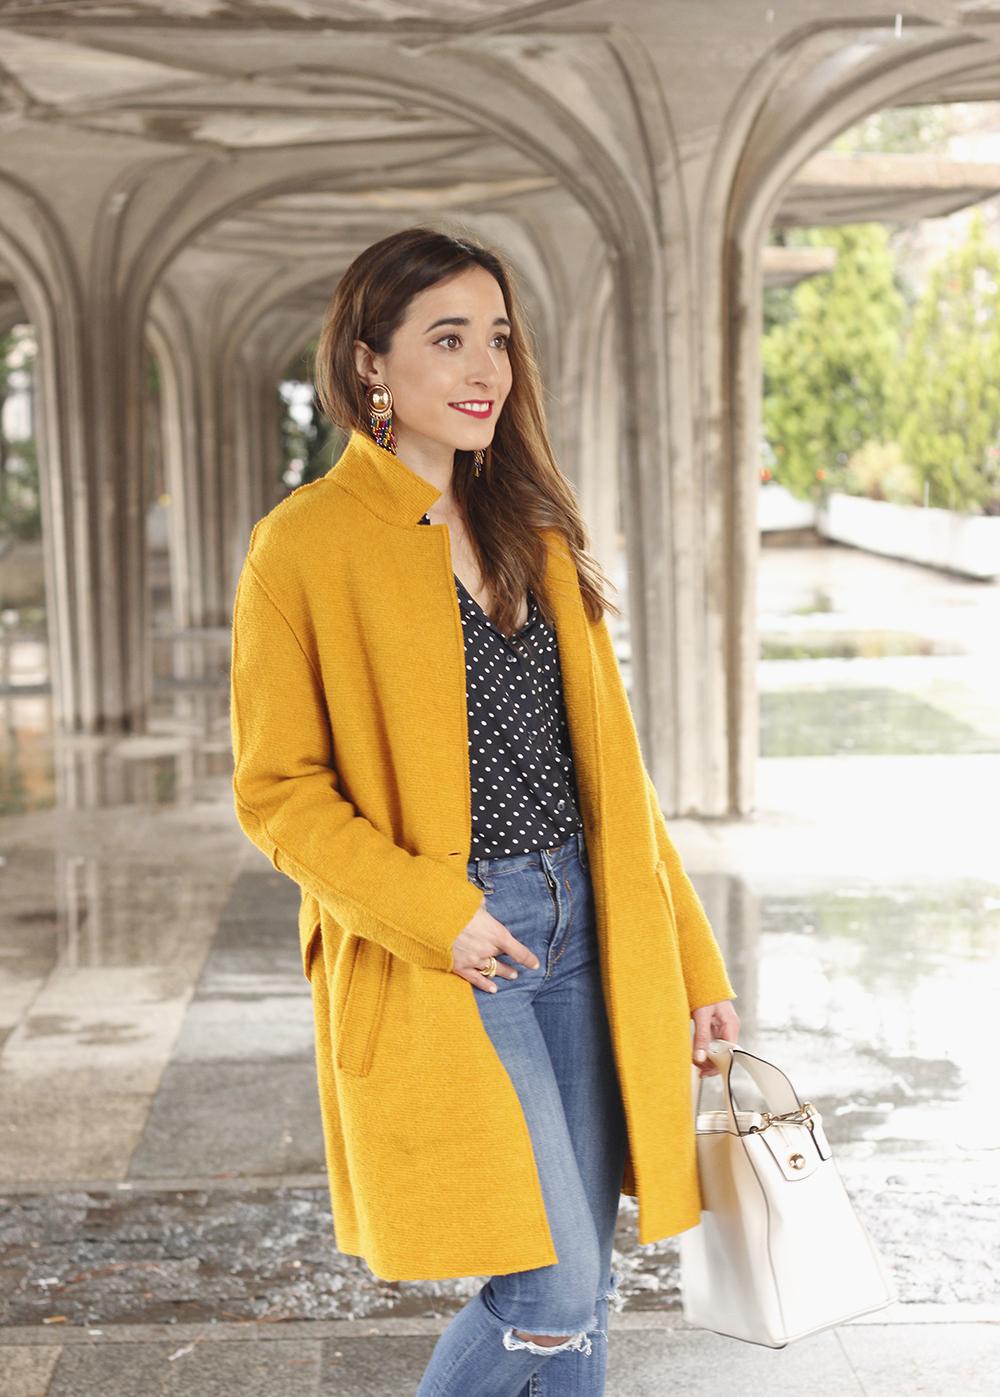 mustard coat polka dots shirt leopard heels white bag outfit 10